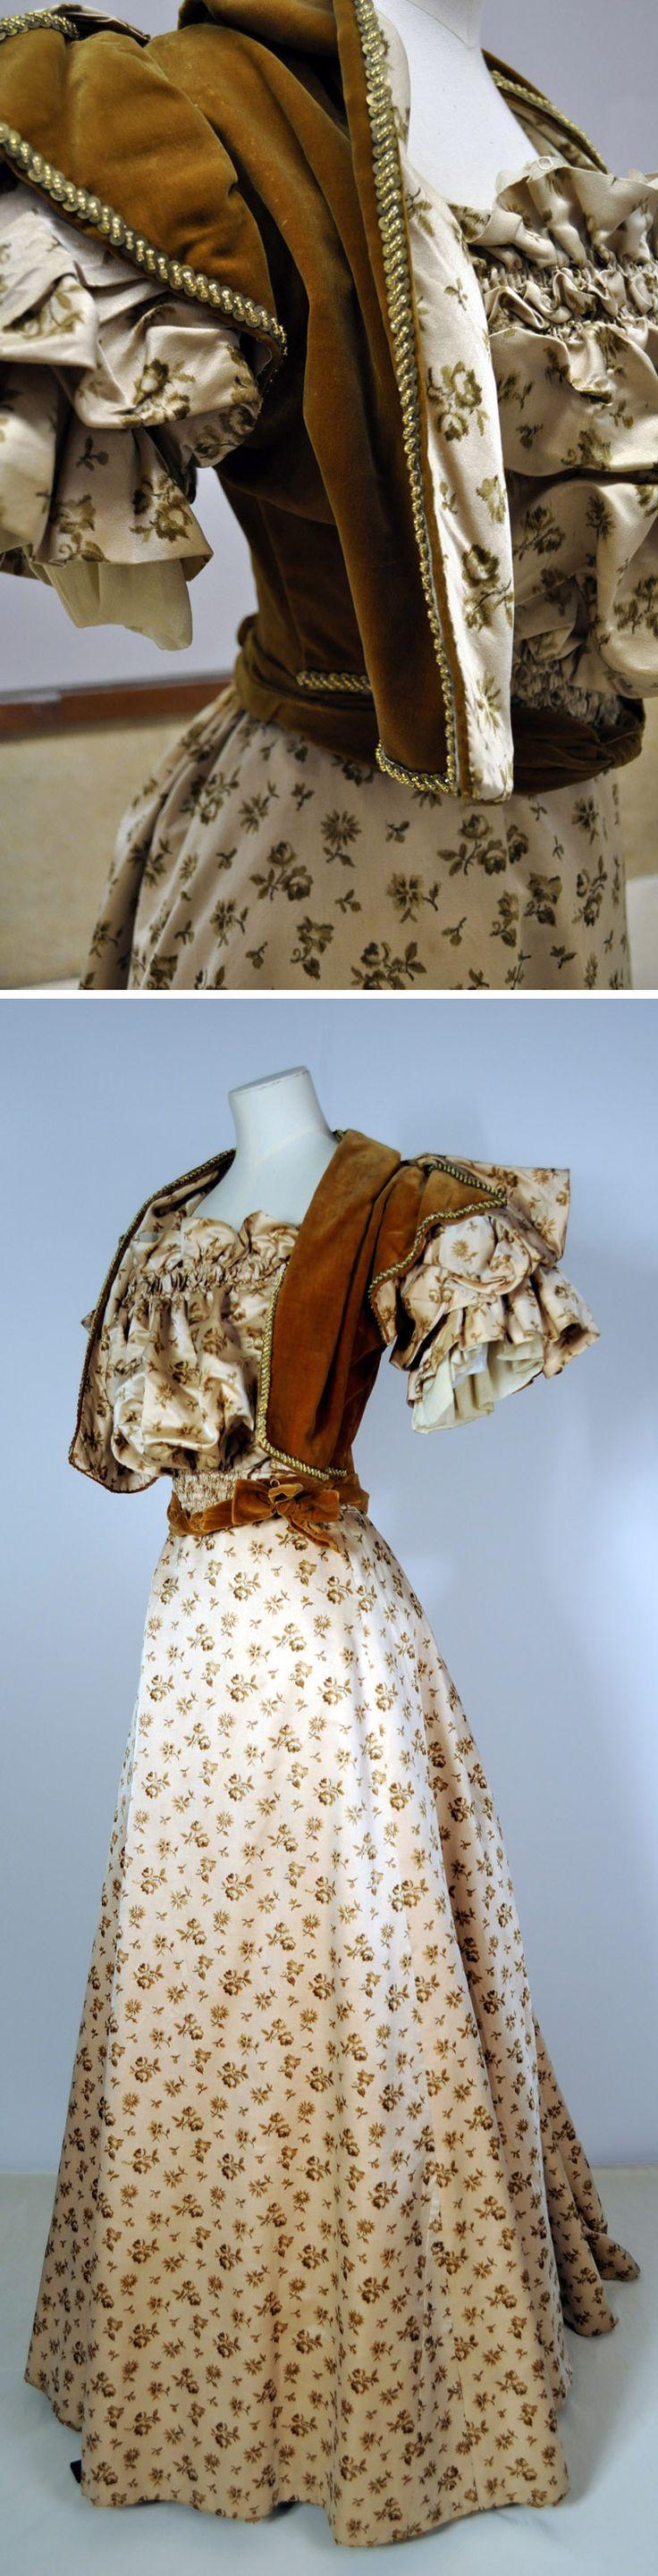 Evening dress ca. 1890s. Herbert Art Gallery & Museum (Coventry, UK) flickr